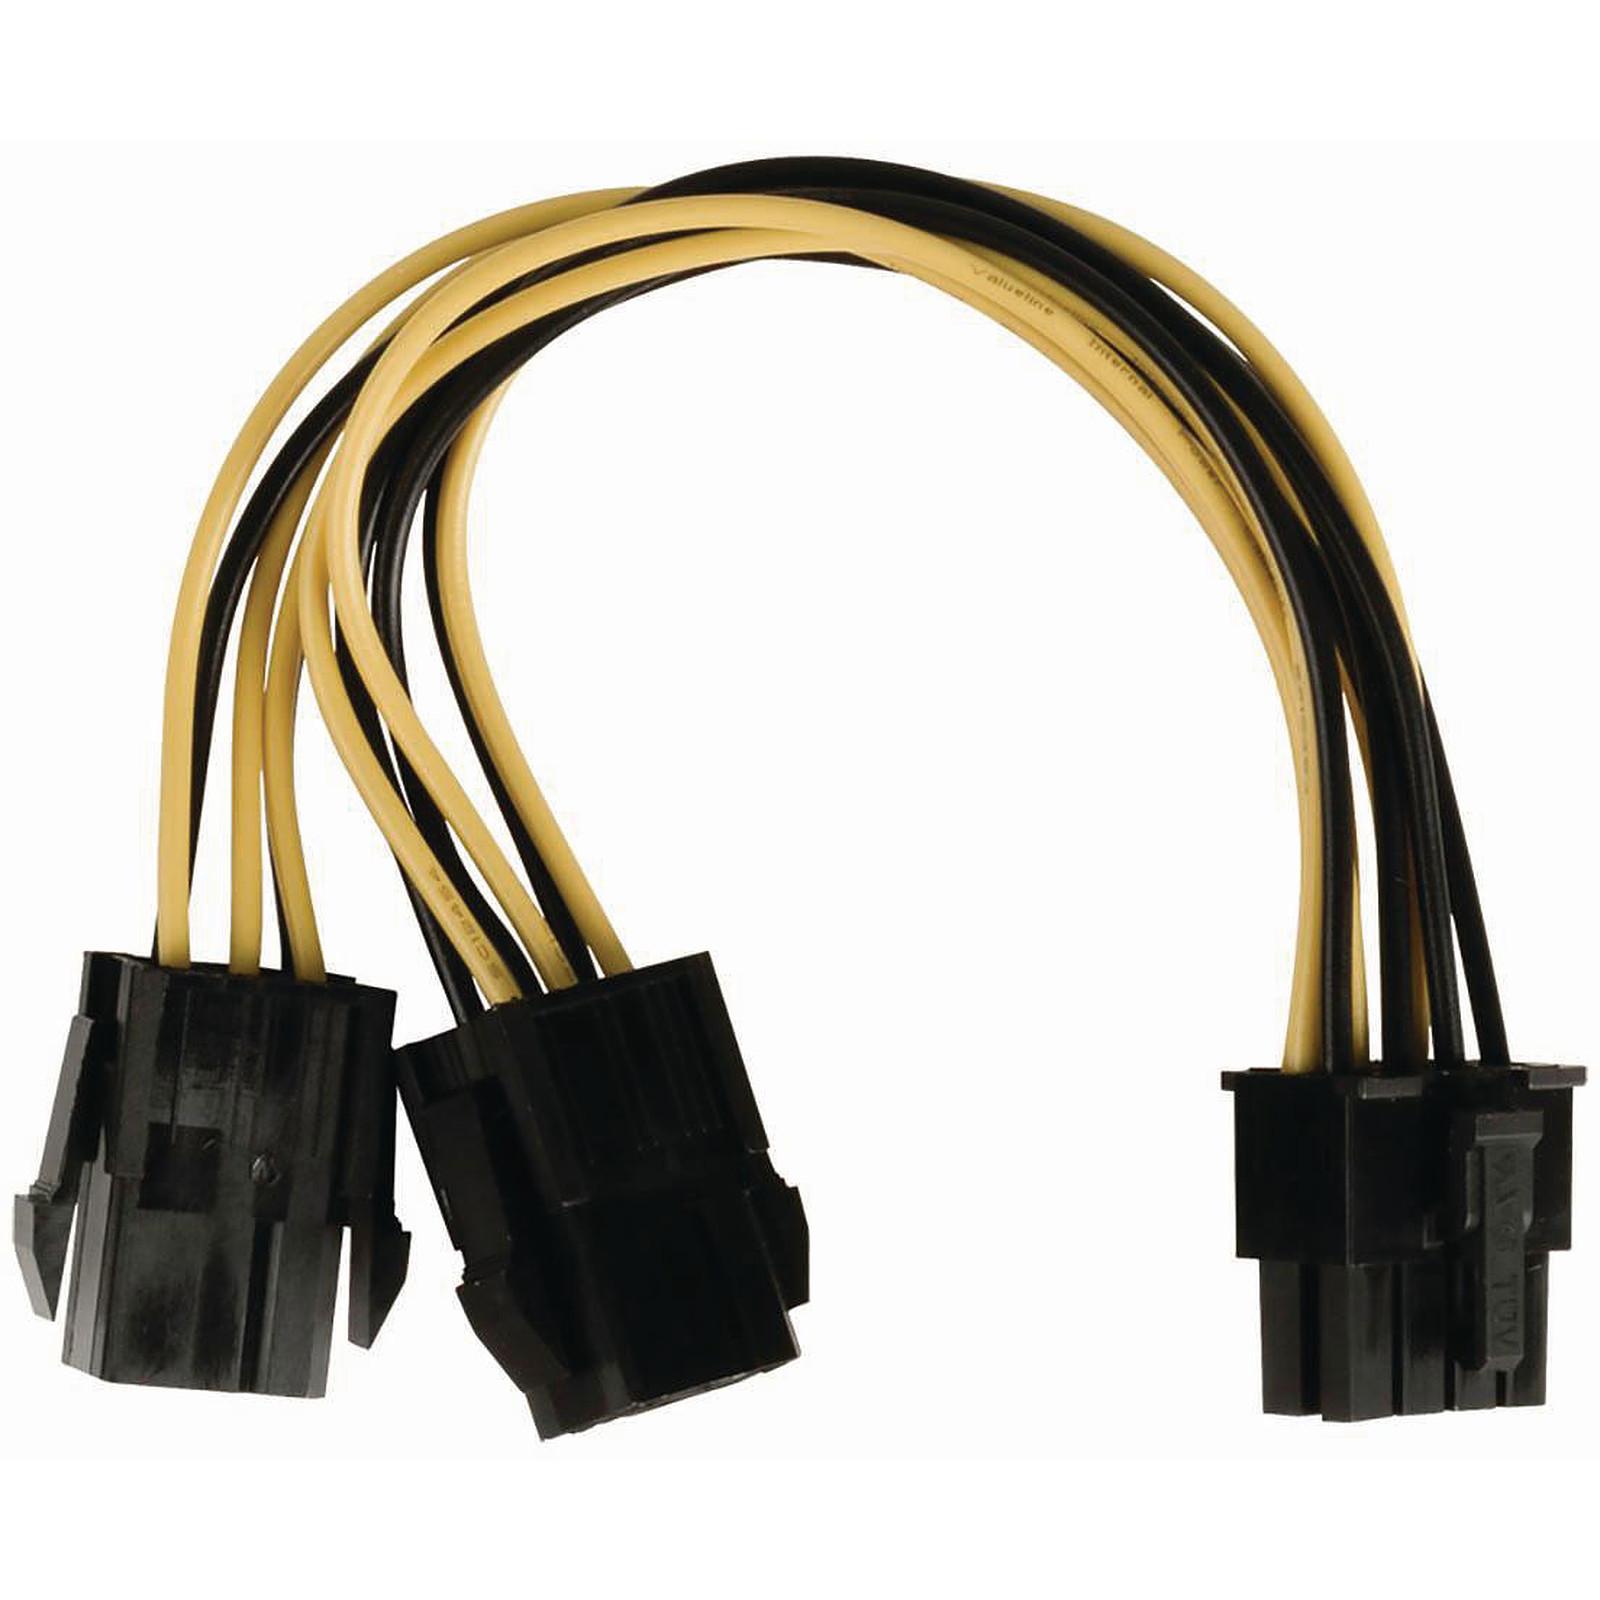 Nedis Adaptateur d'alimentation 2x PCI-Express 6 broches vers P8